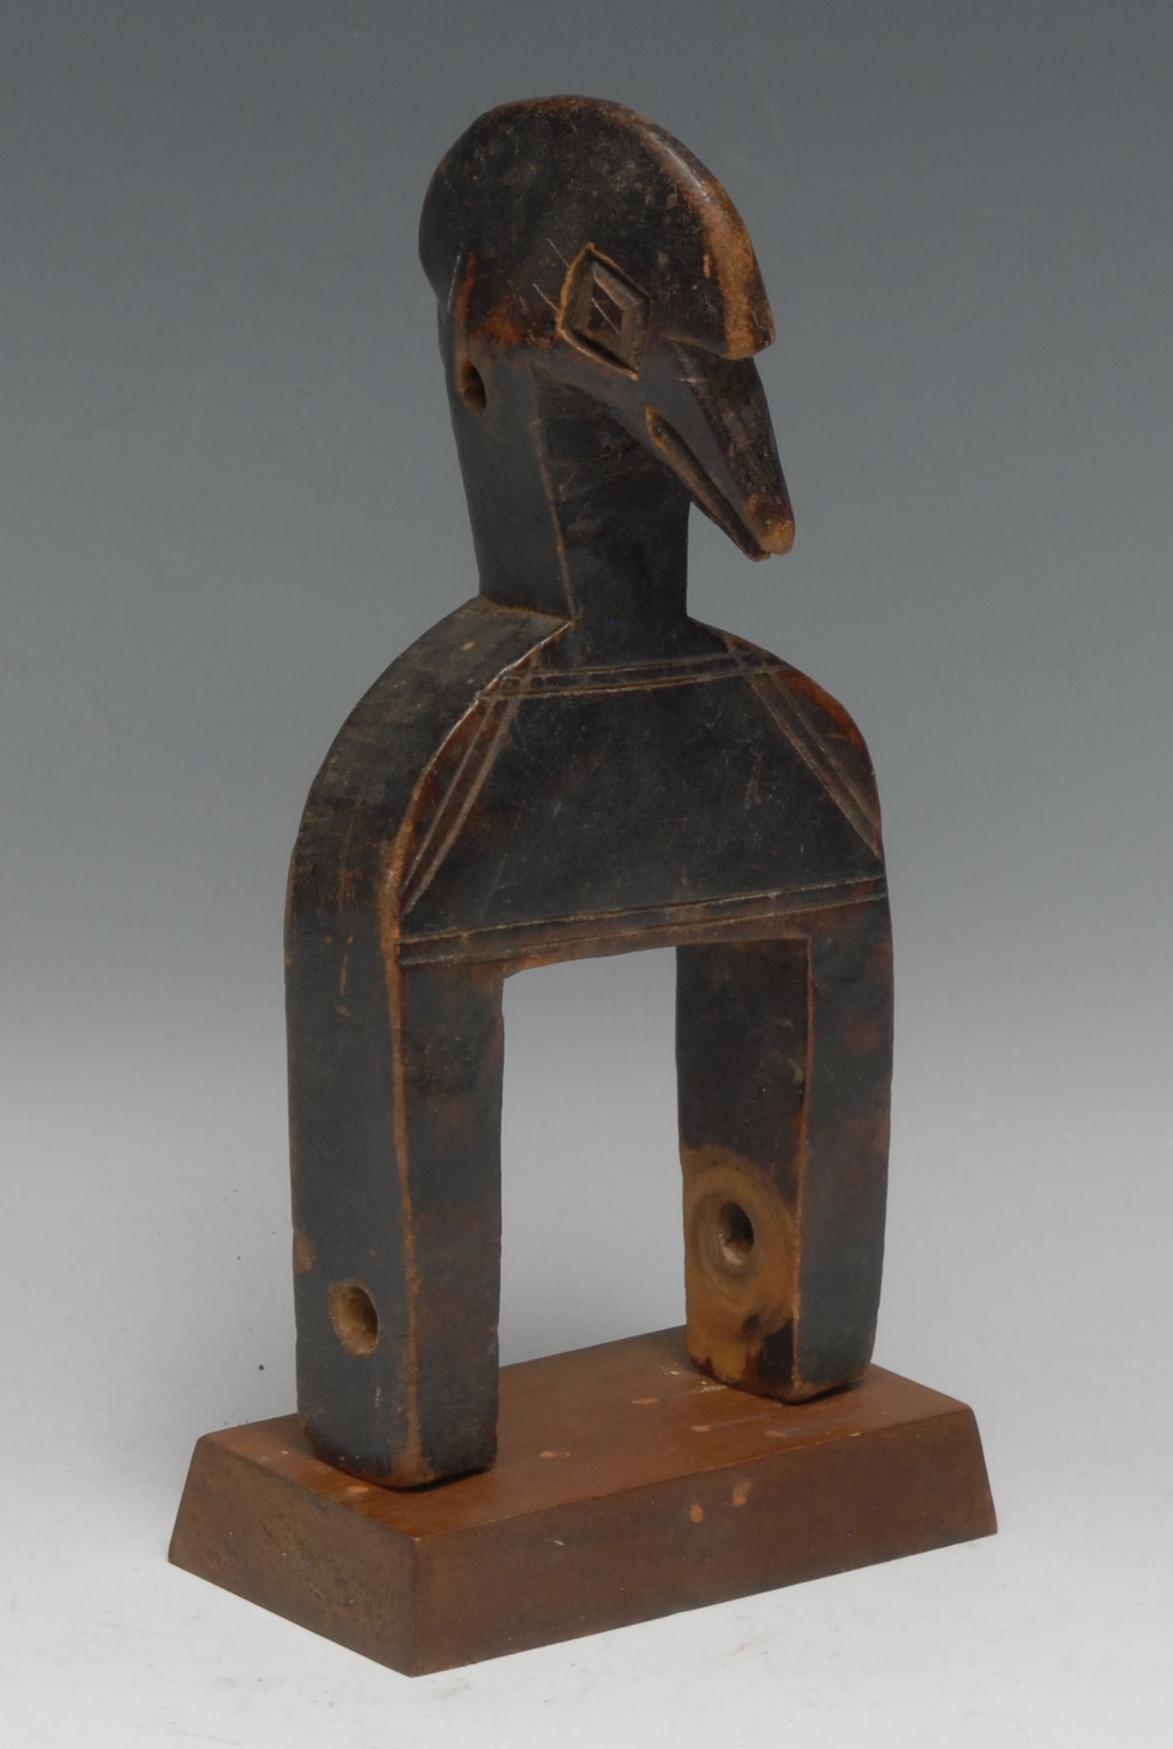 Tribal Art - a Senufo heddle pully figure, carved as a stylized bird, 21cm high, Ivory Coast, West